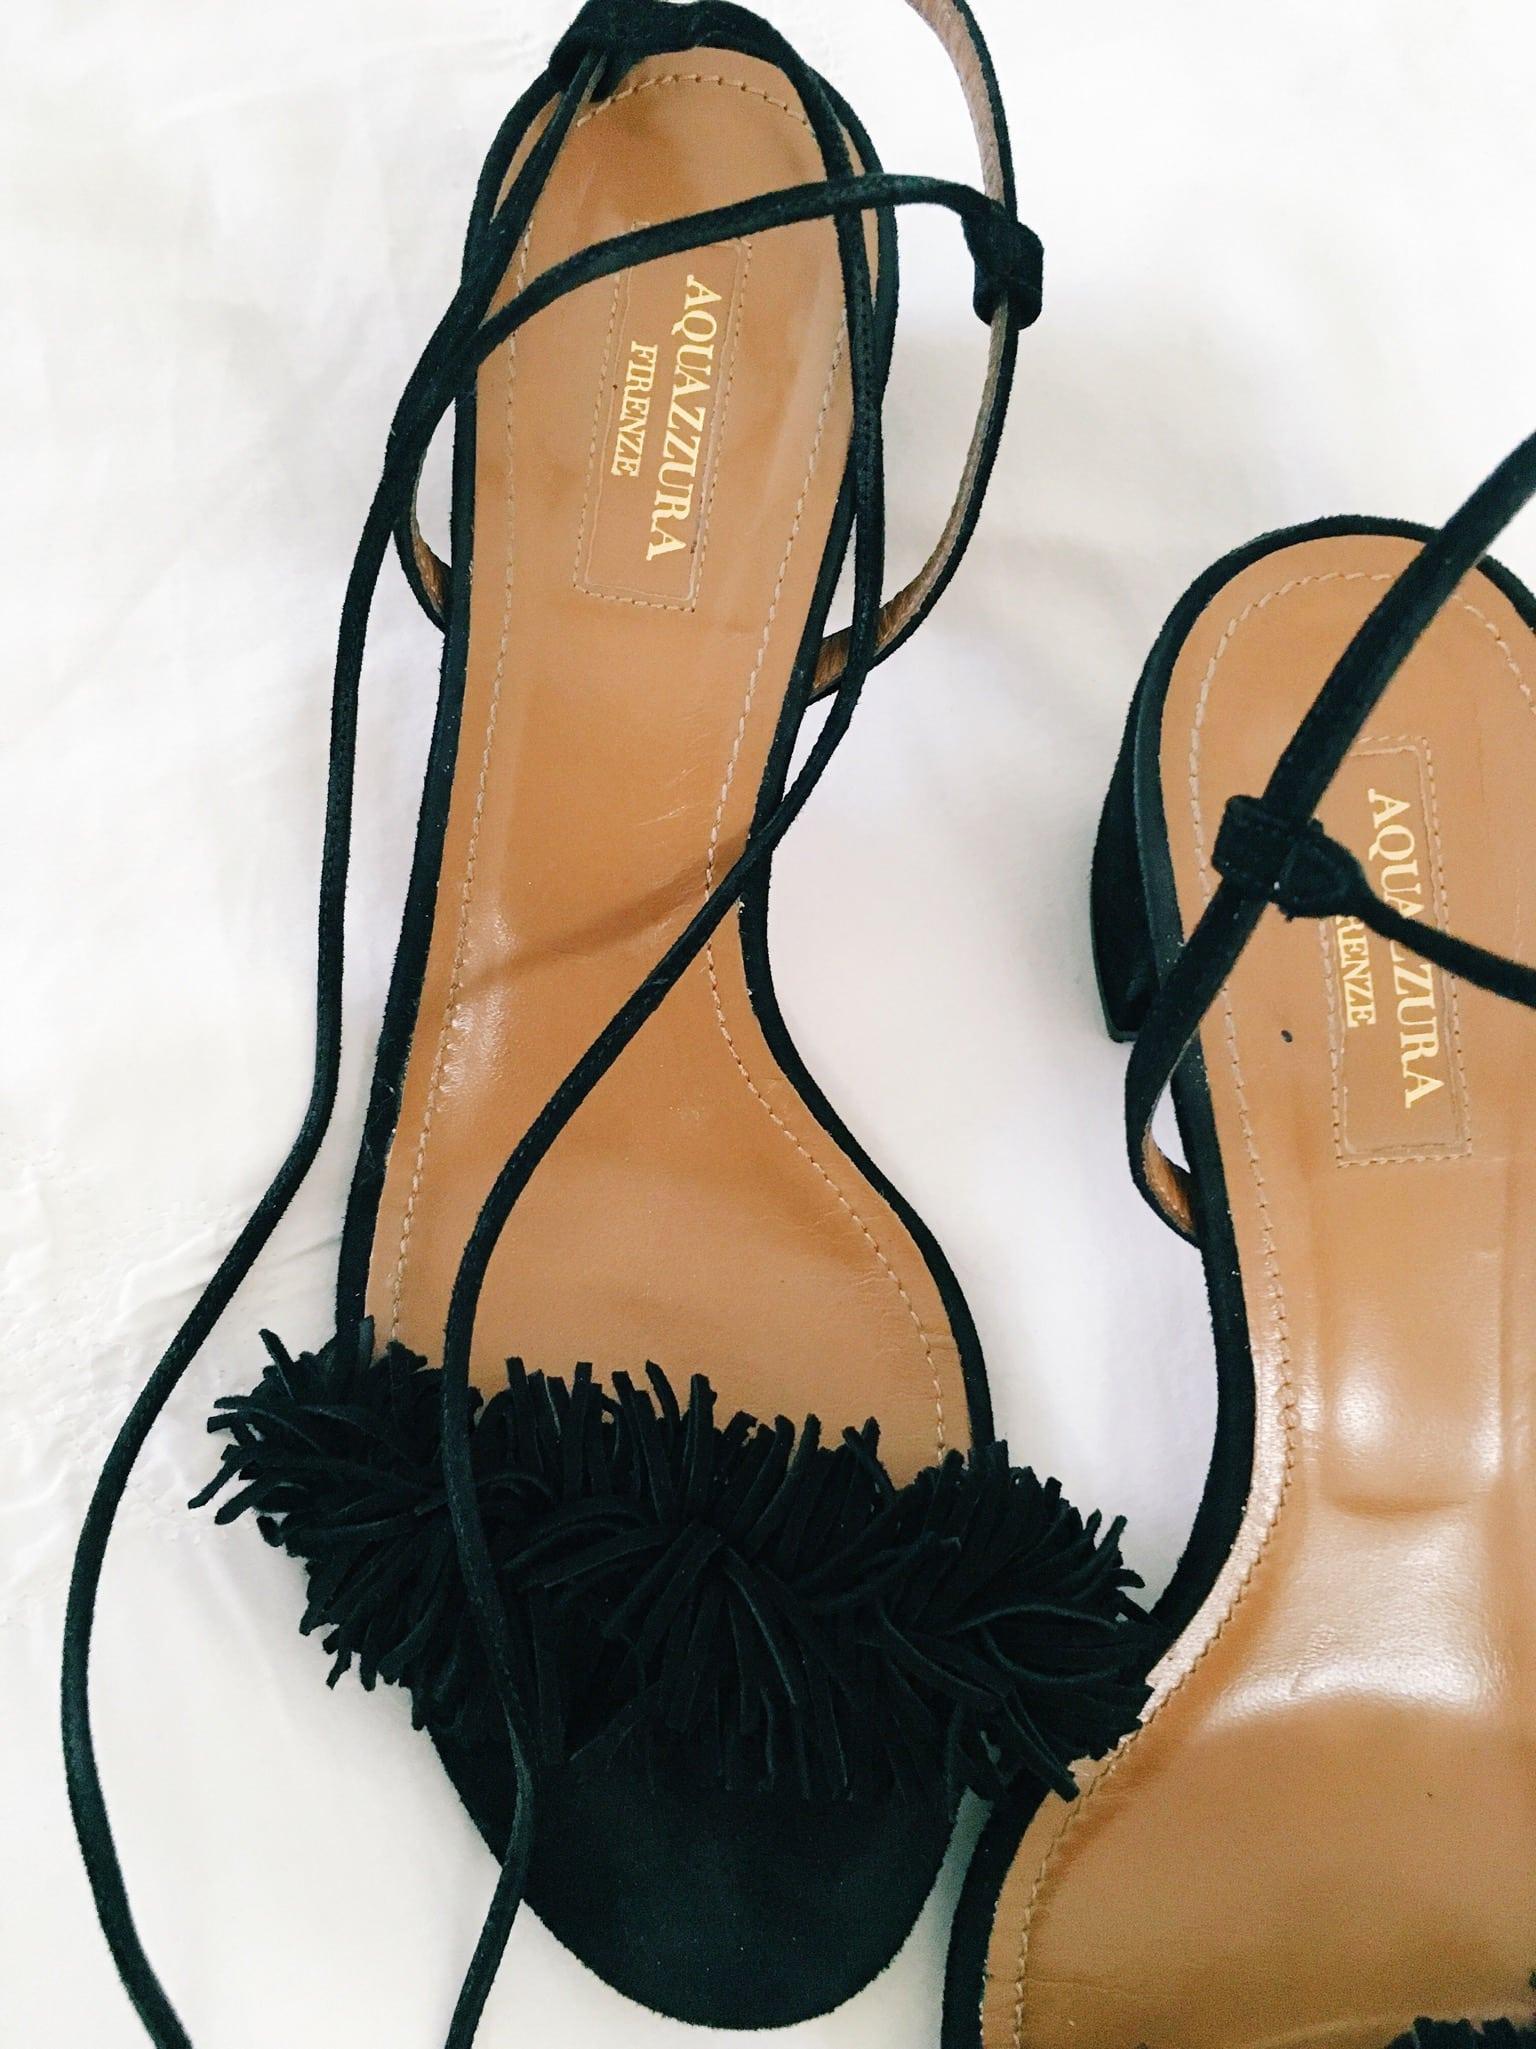 aquazzura firenze fringe shoes